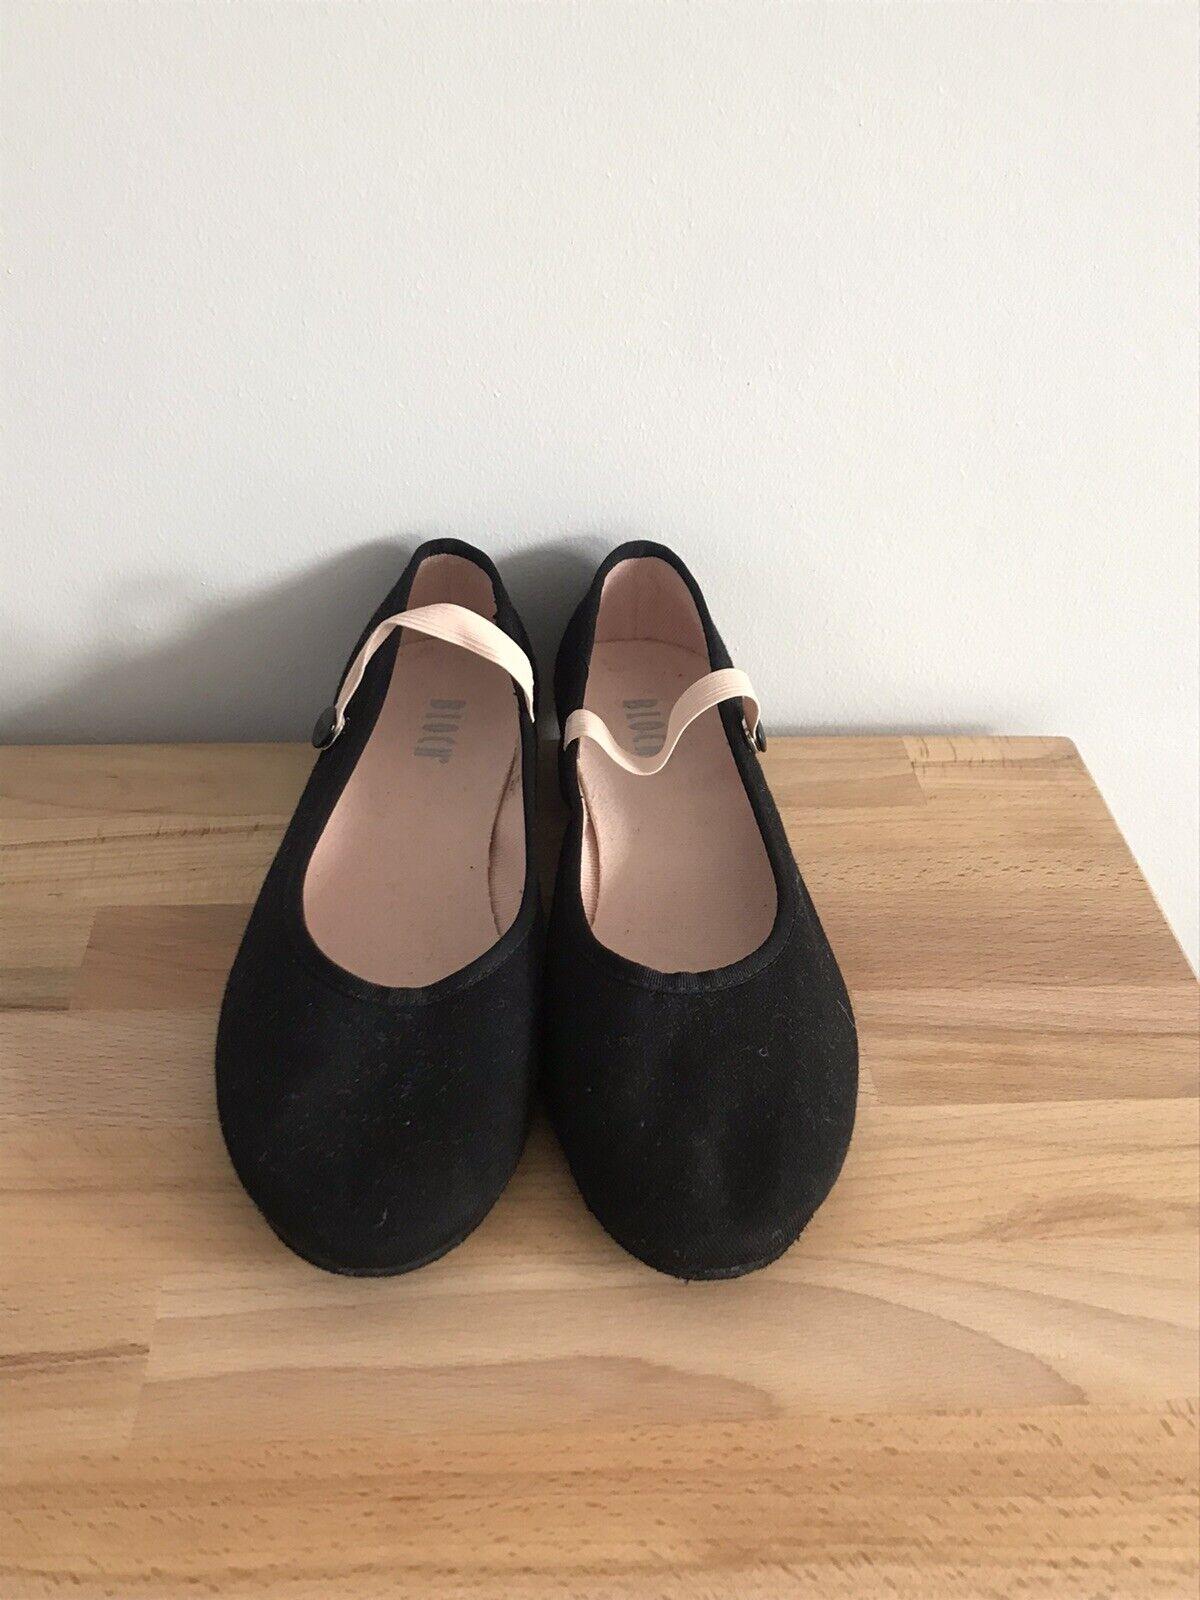 Bloch Children's Character Shoes